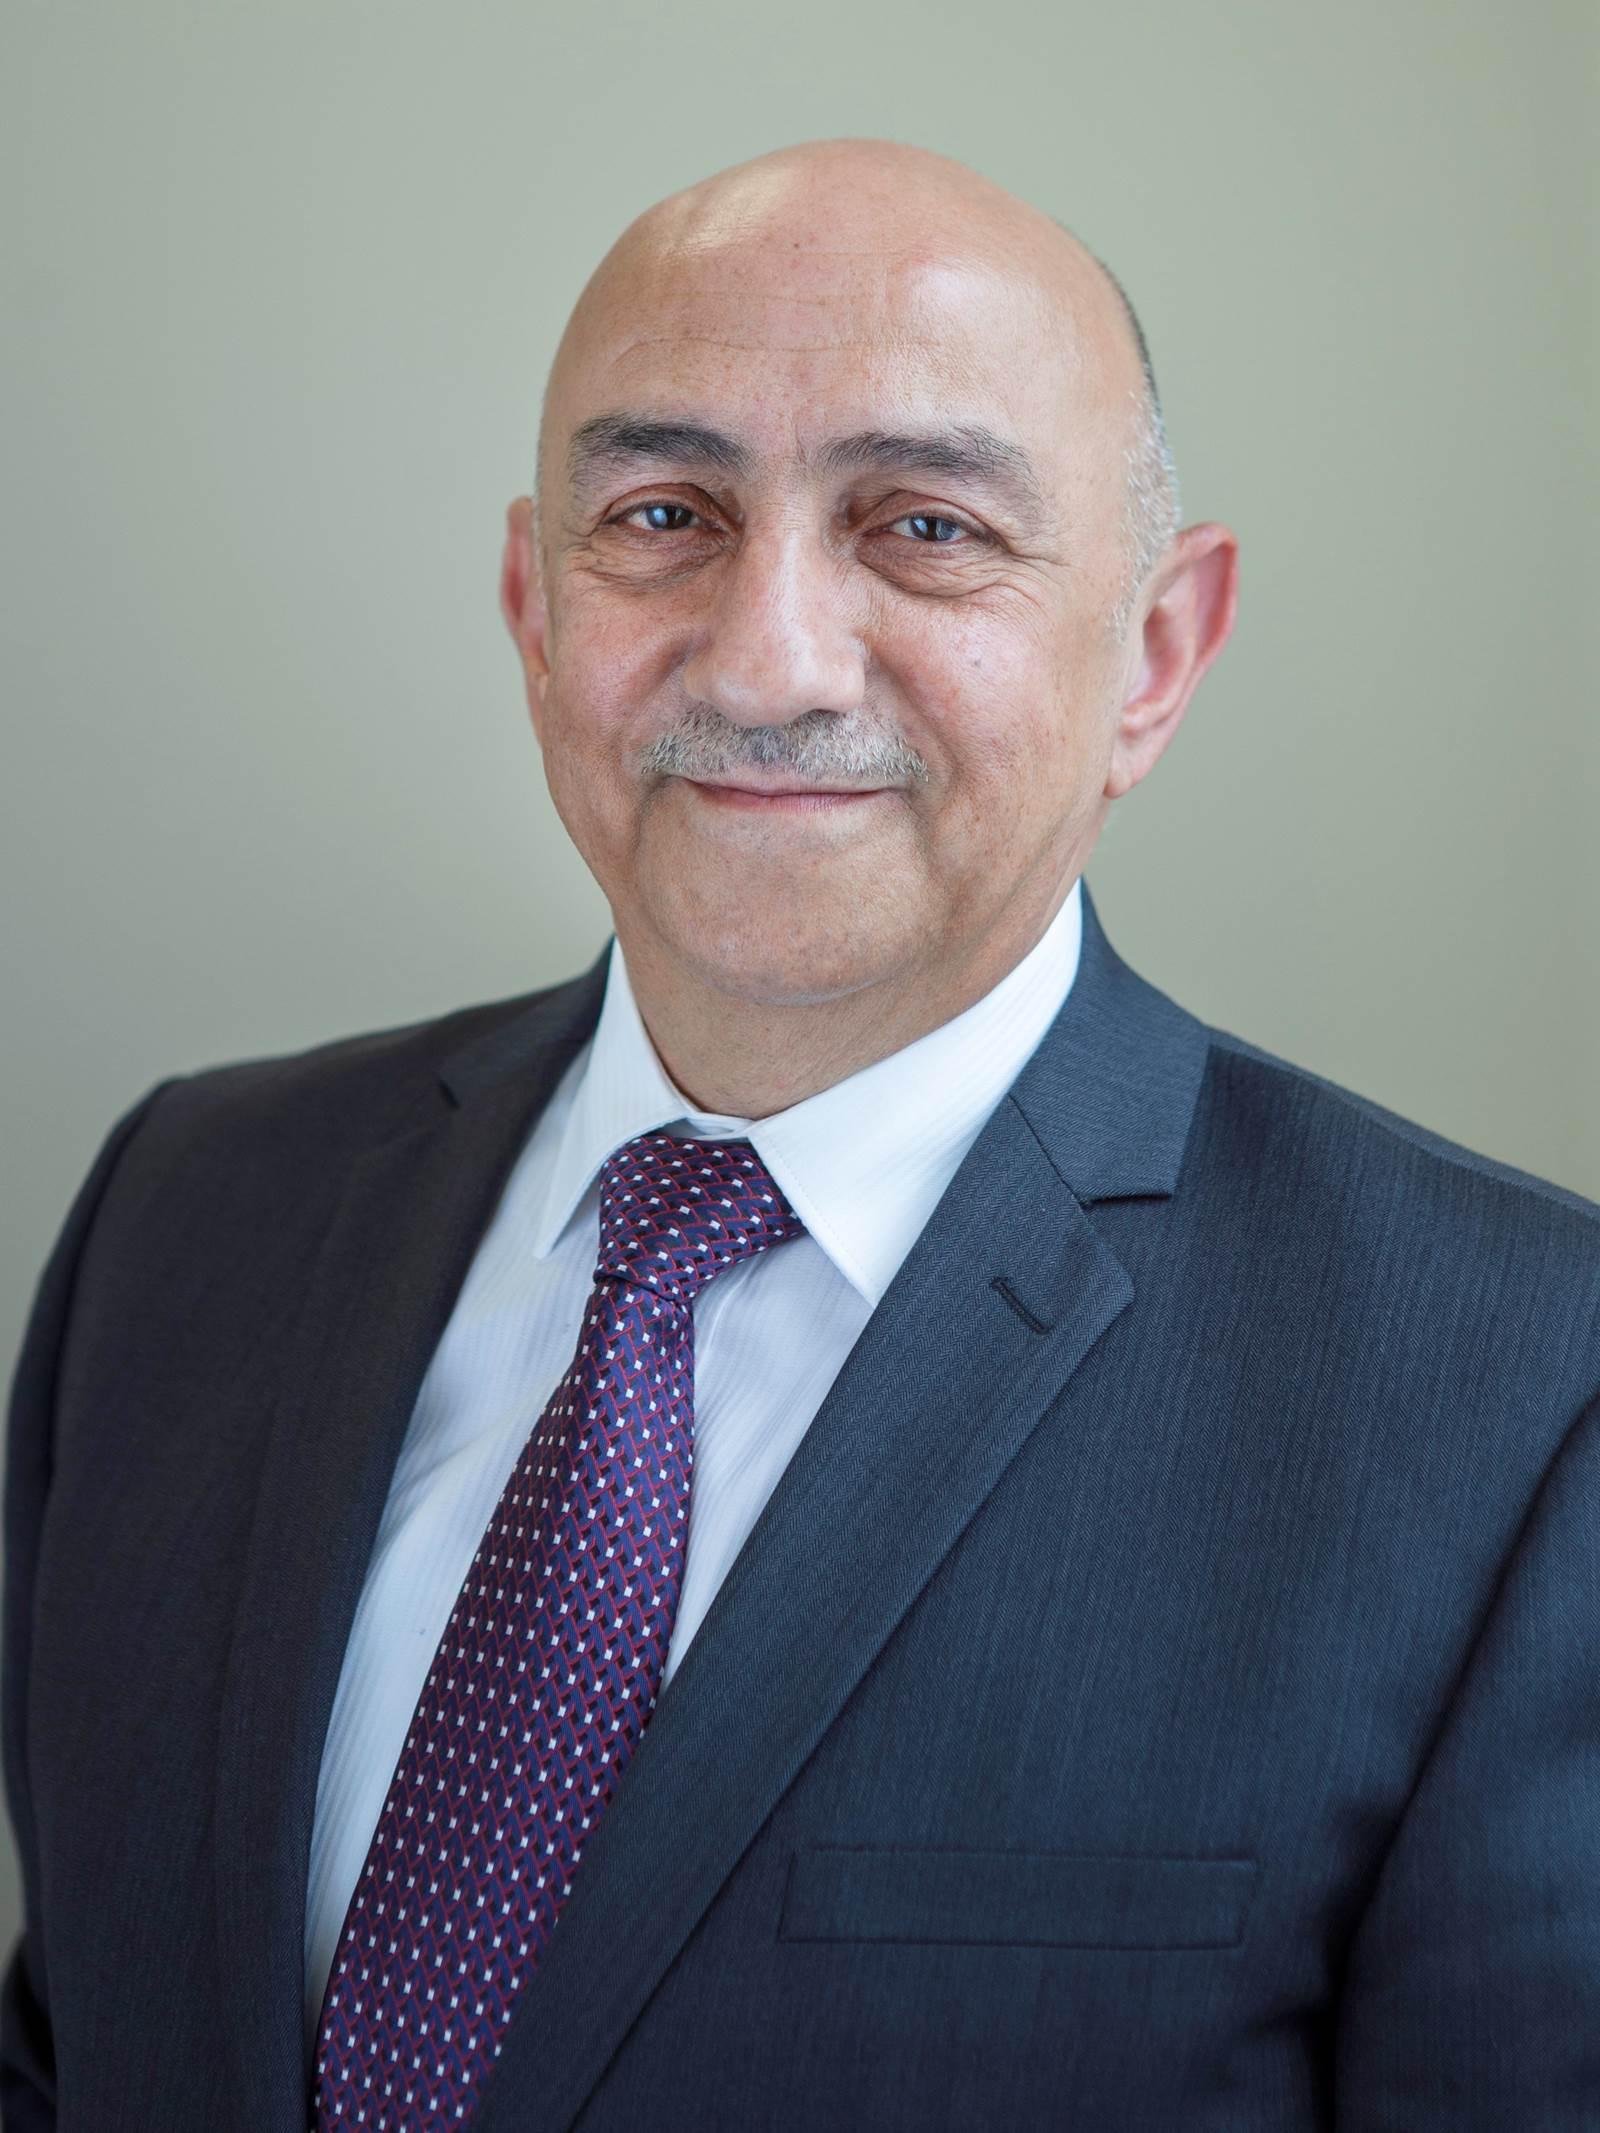 Faris Alshamsi